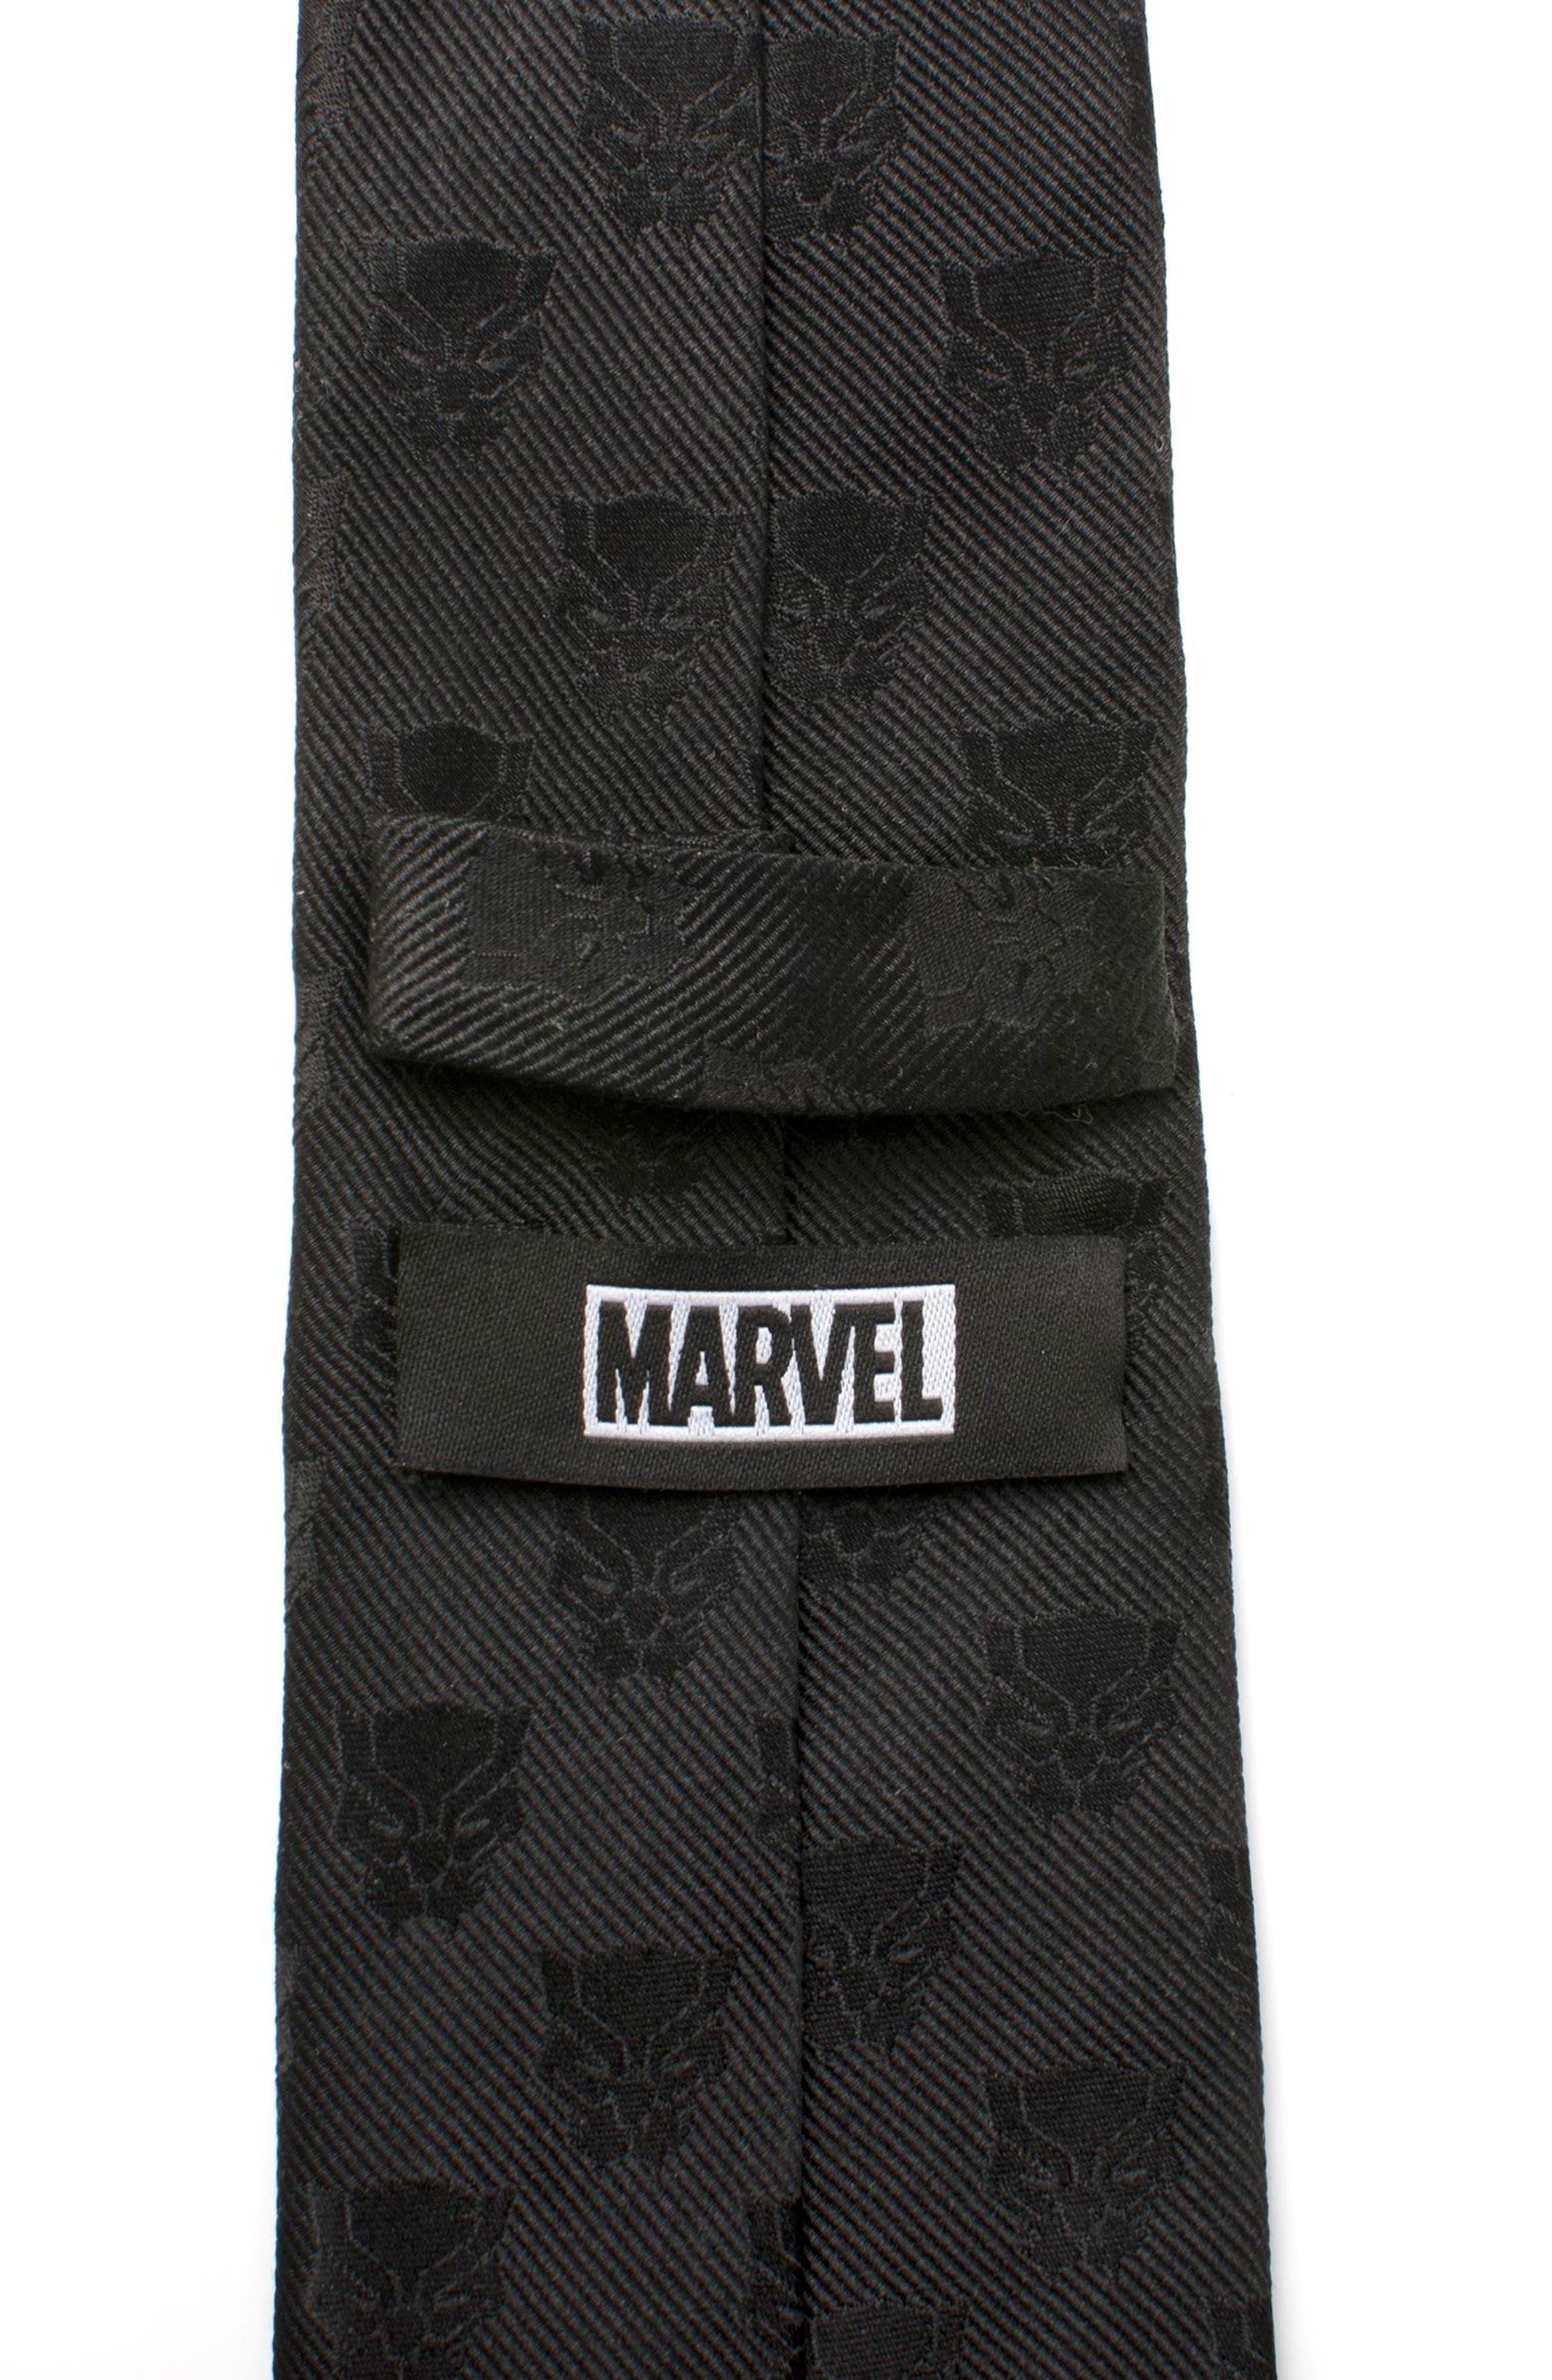 Black Panther Silk Tie,                             Alternate thumbnail 5, color,                             BLACK